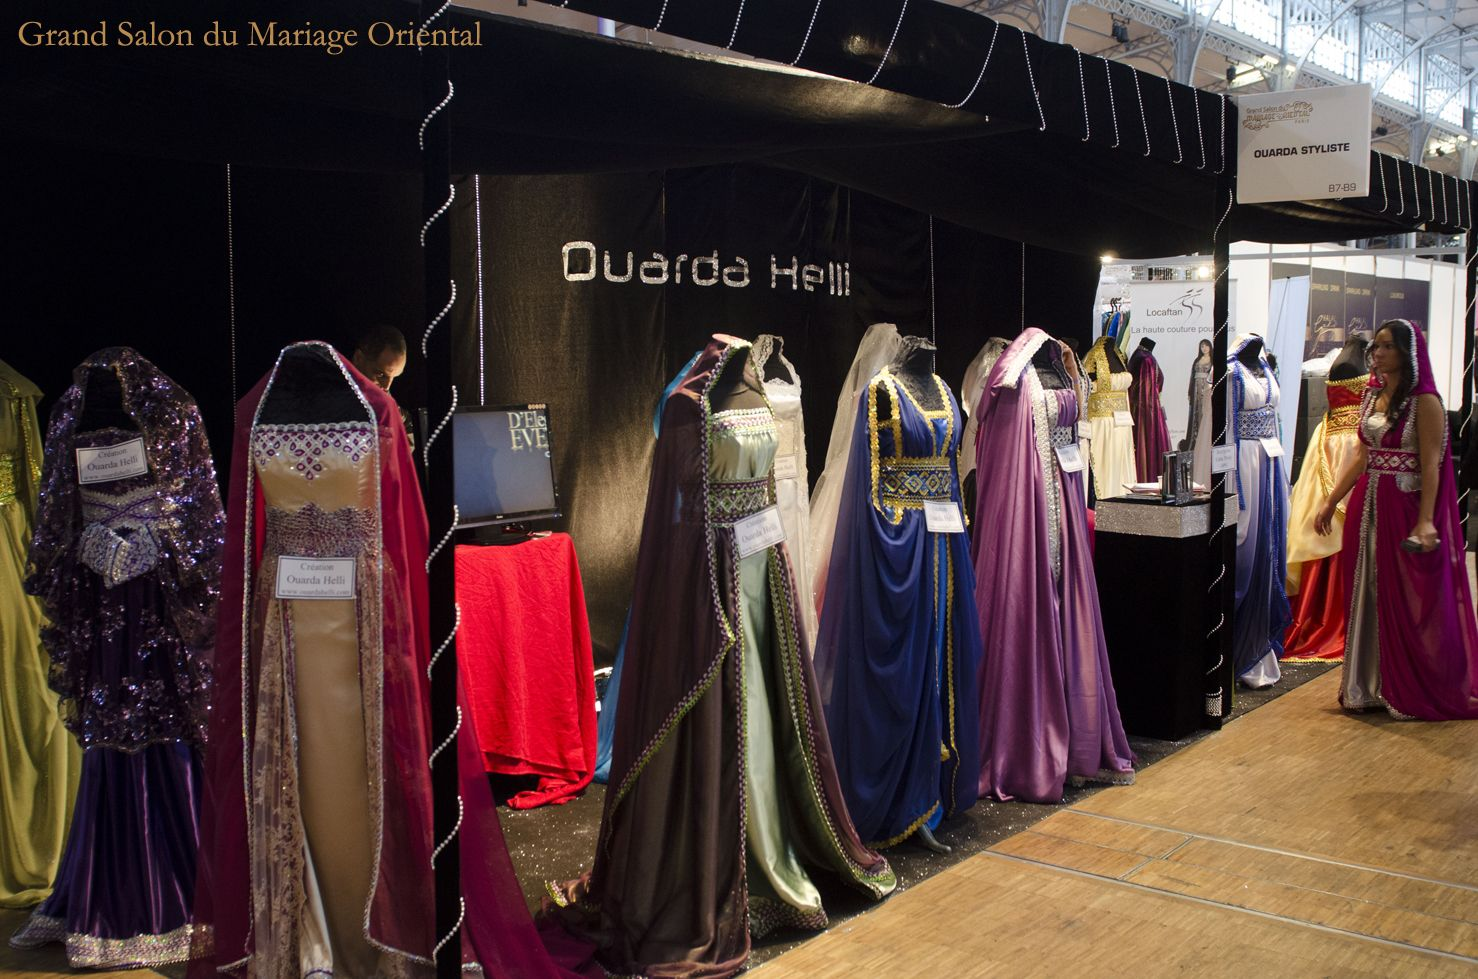 Ouarda helli cr atrice de robe berb re kabyle mandap d coration indienne indian wedding - Salon du mariage oriental ...